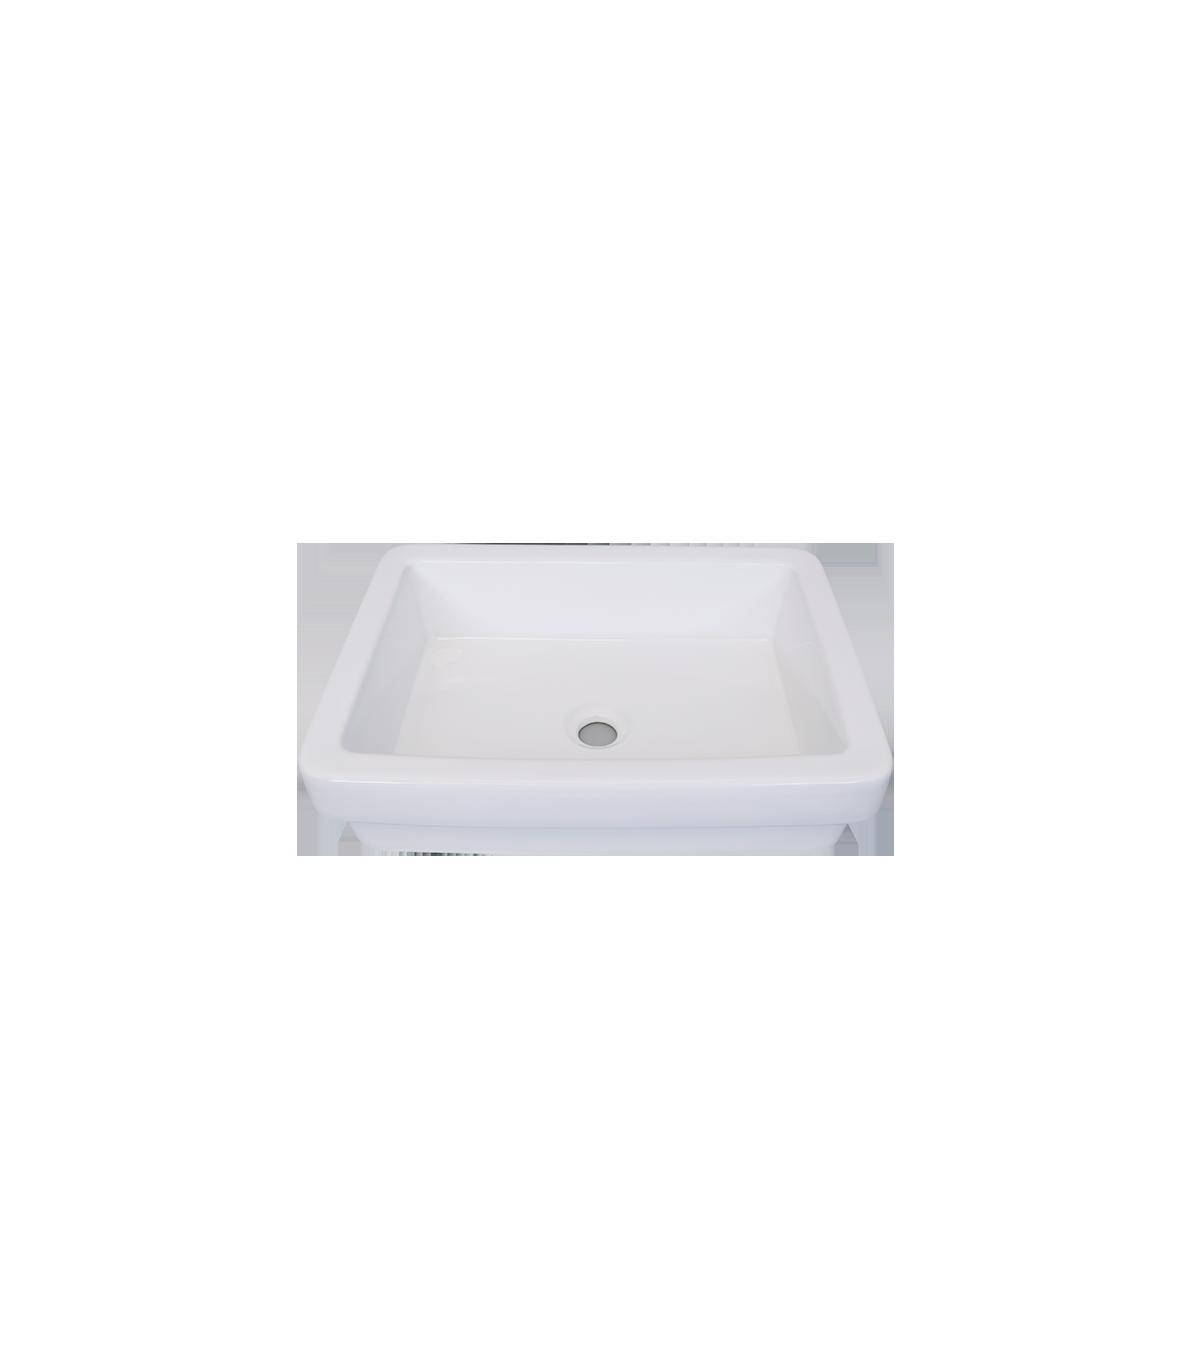 LS-C24 Above Counter Ceramic Sink White